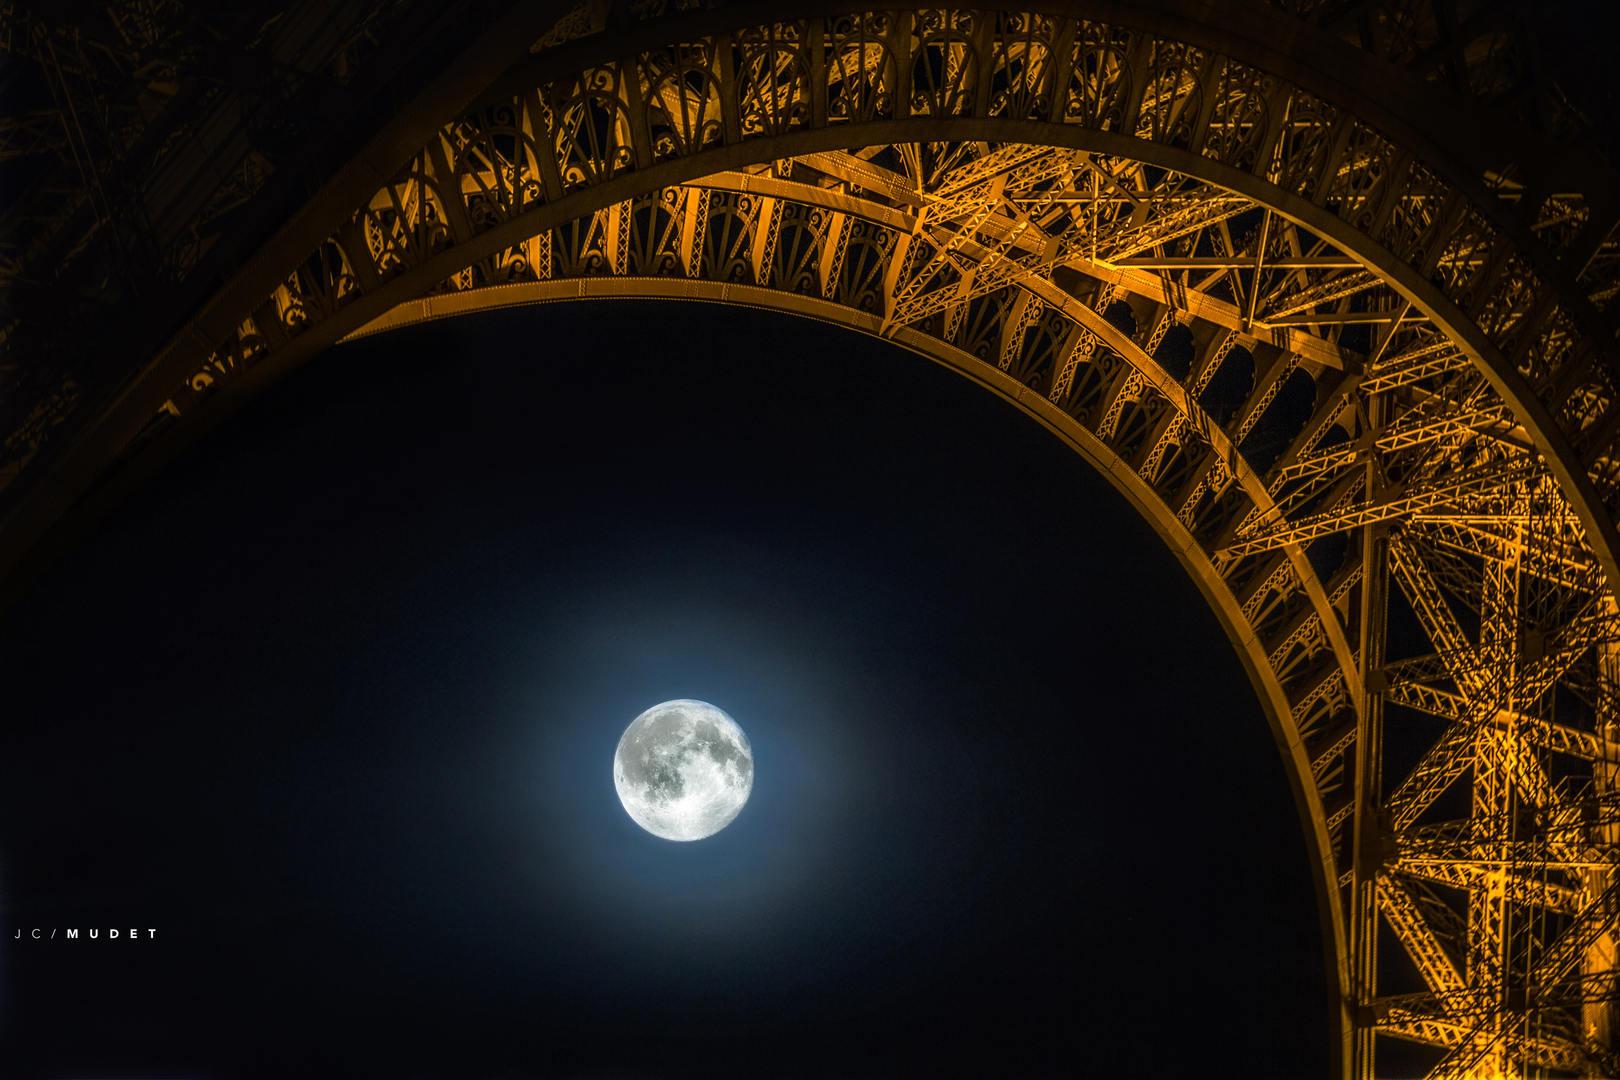 The Paris moonlight sonata